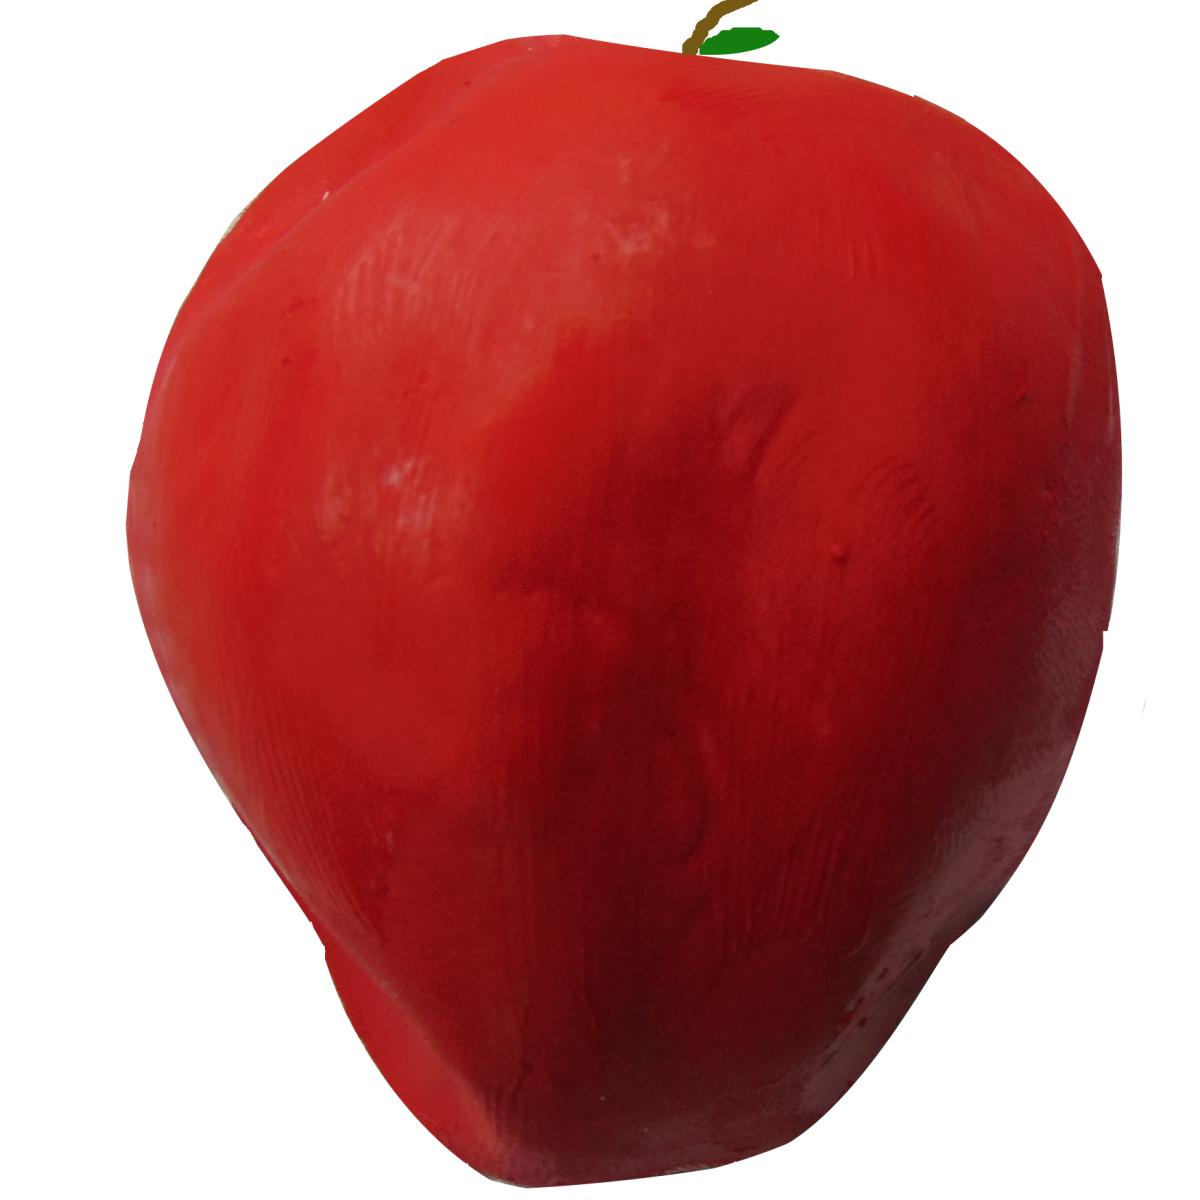 Plaster Apple